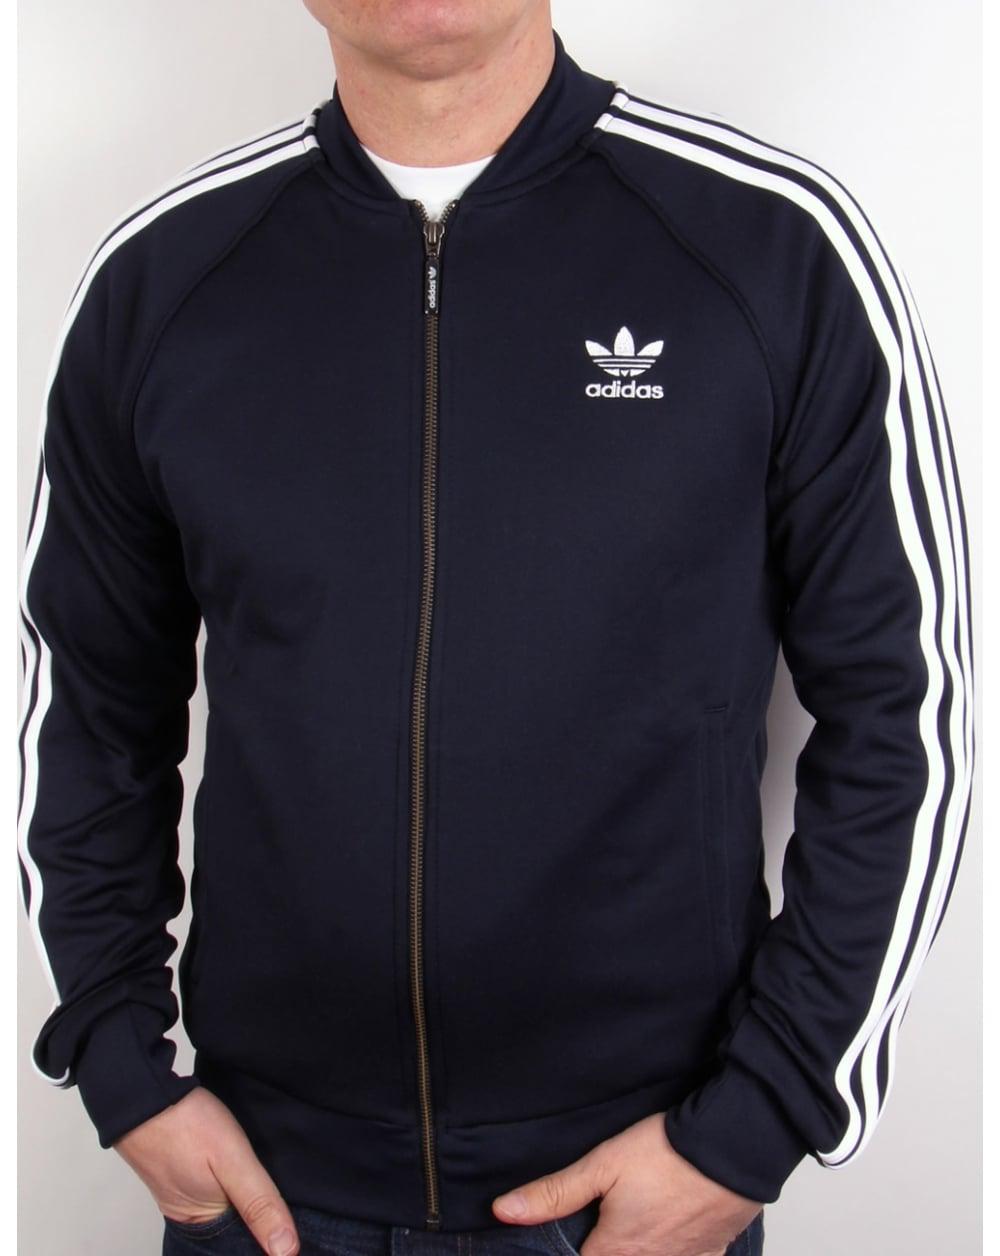 Adidas Top Ten Hi Sleek Bow Zip Trainers: Adidas Originals Superstar Track Top Navy Blue / Legend